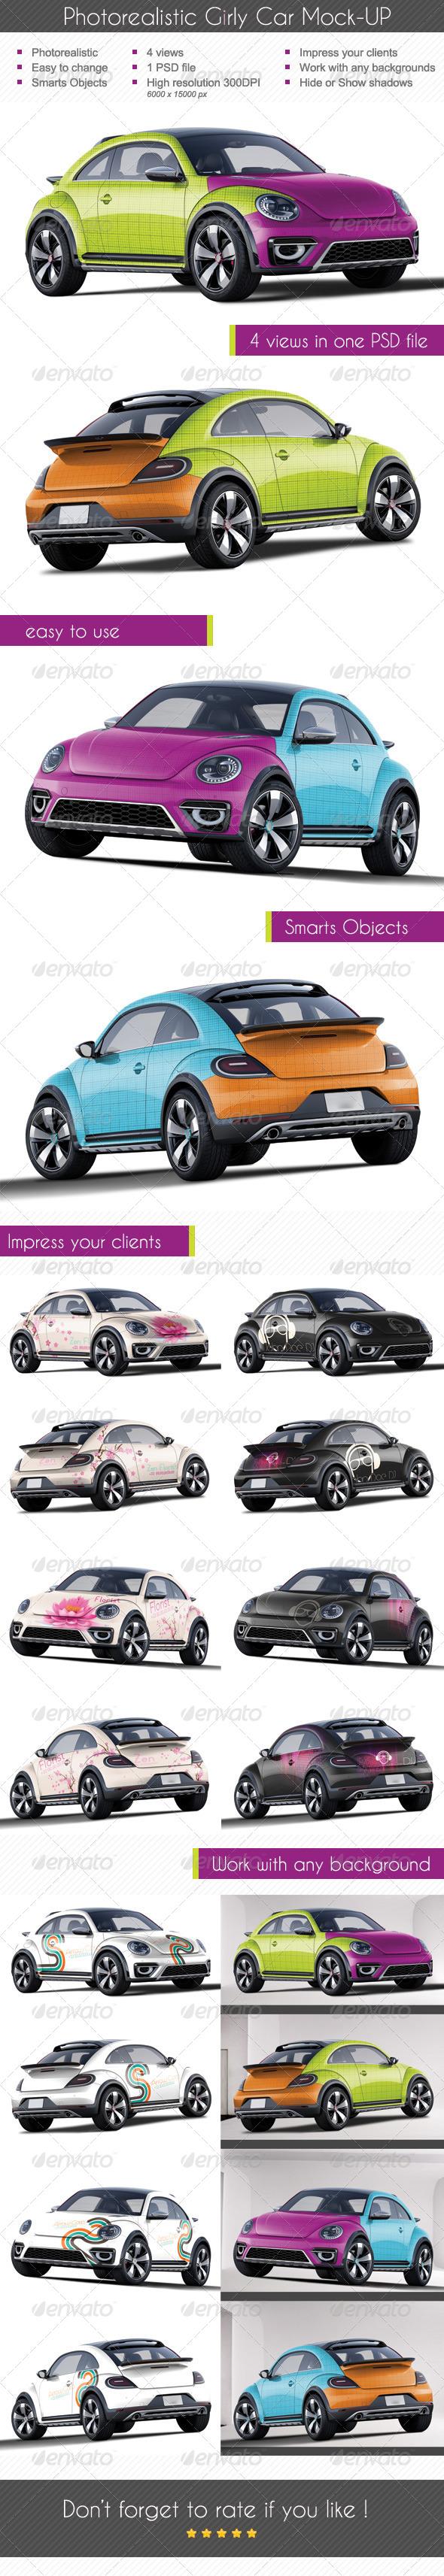 Photorealistic Girly Car Mock-up